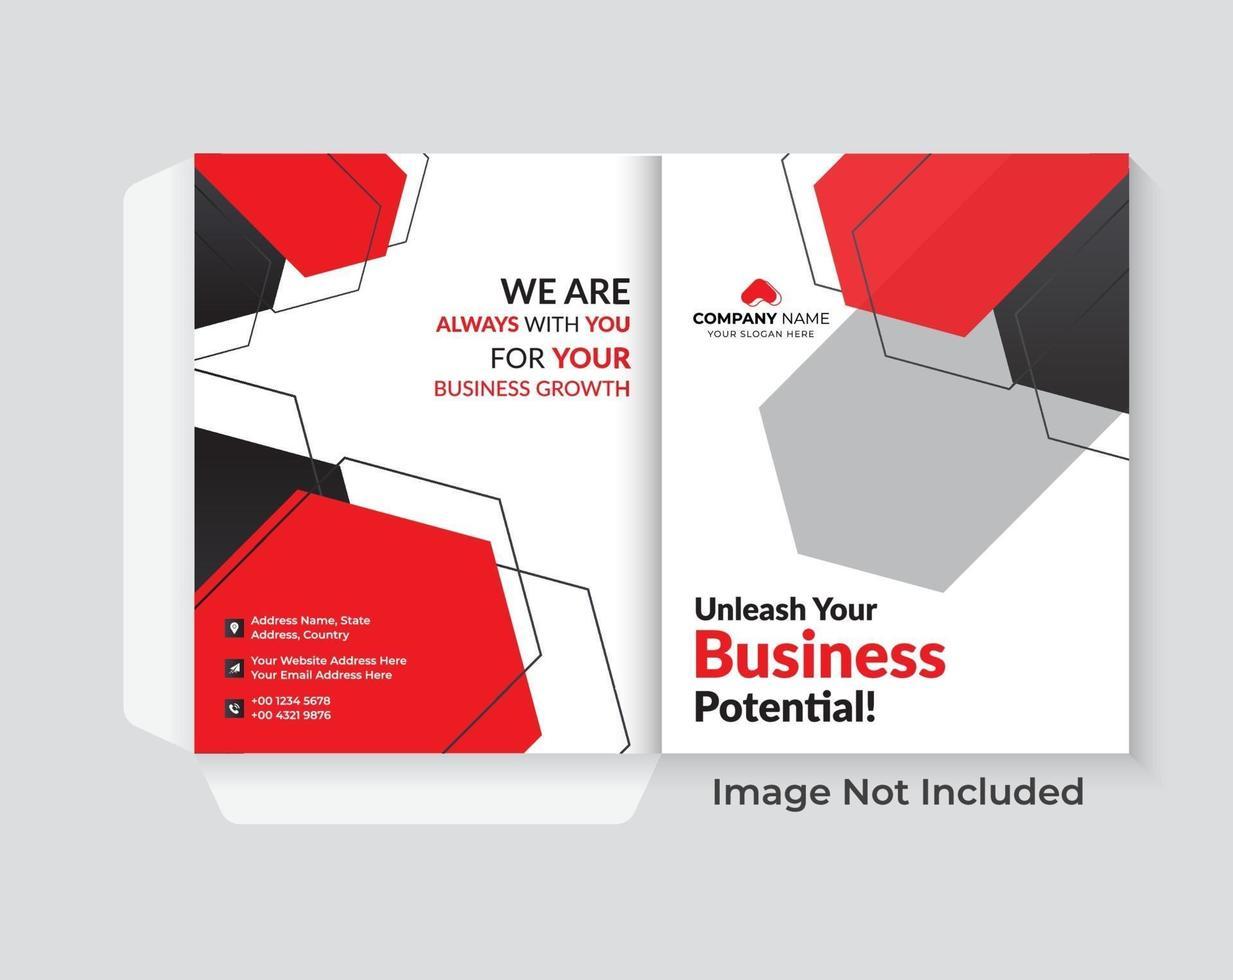 diseño de portada para conjunto de presentación de carpeta vector